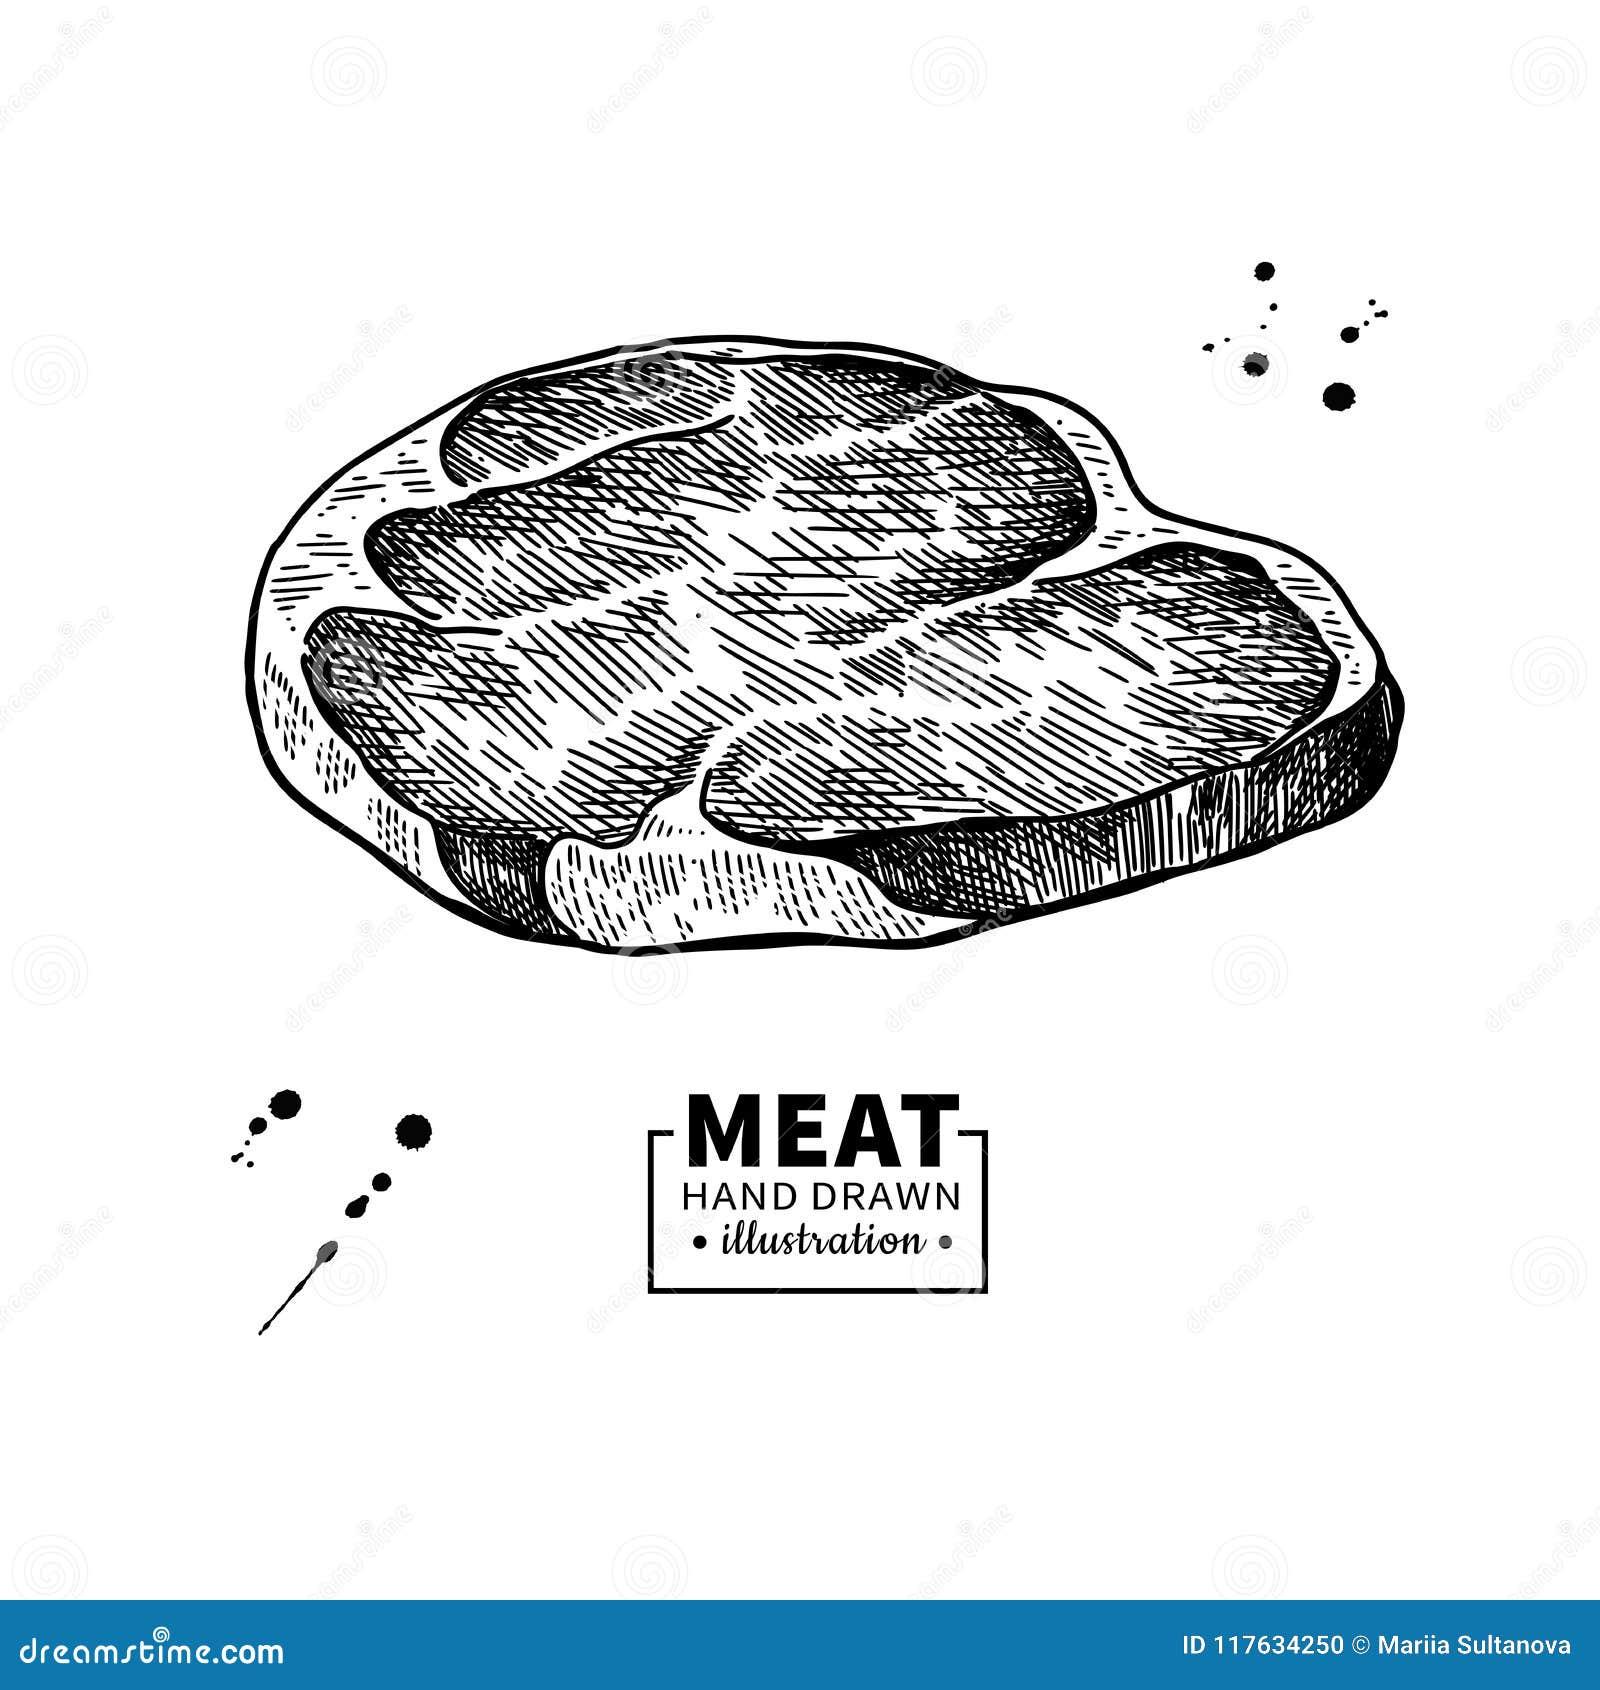 Dessin Cru De Vecteur De Bifteck De Boeuf Croquis Tire Par